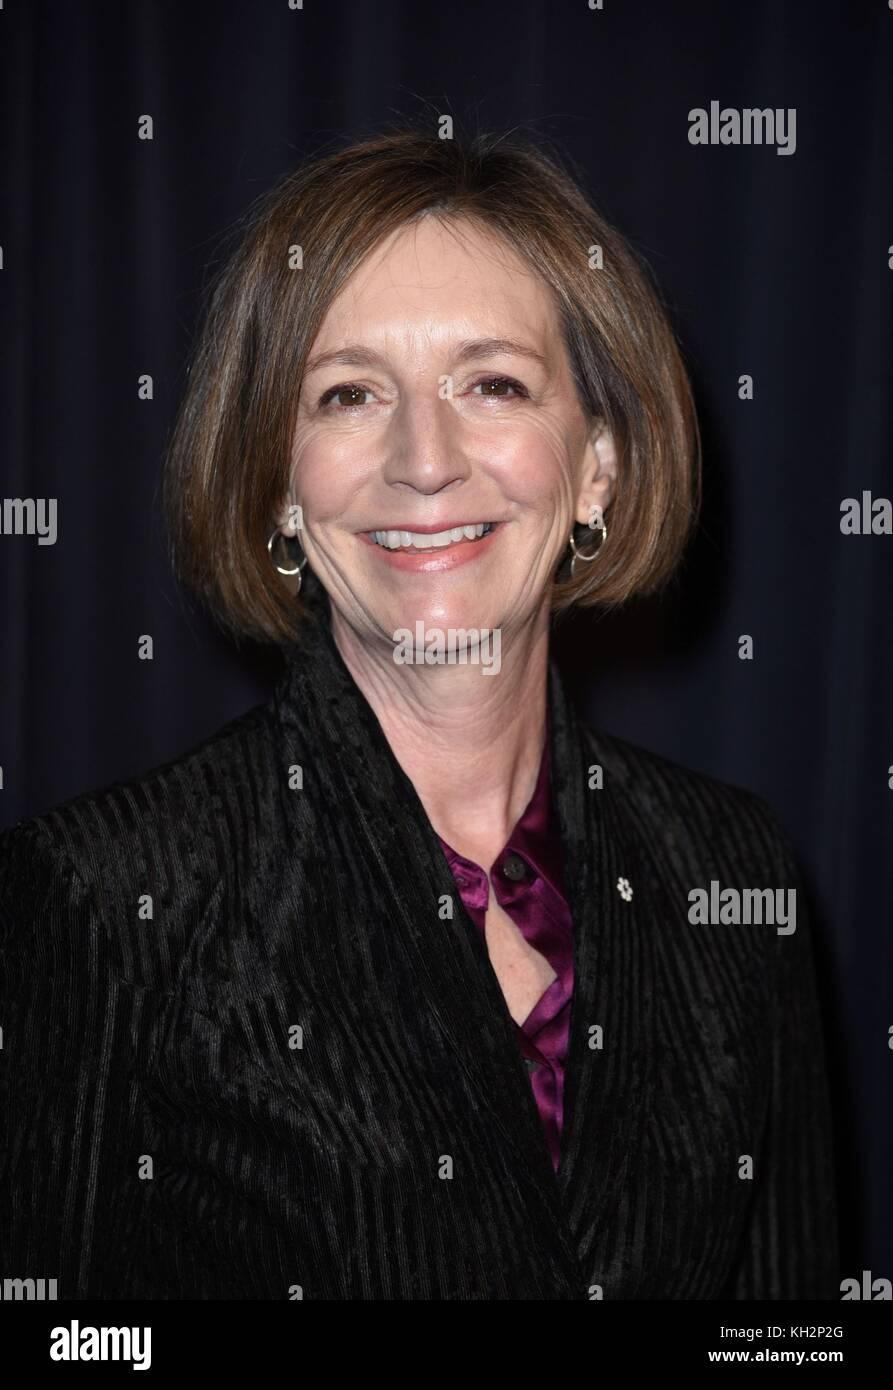 Susan Coyne